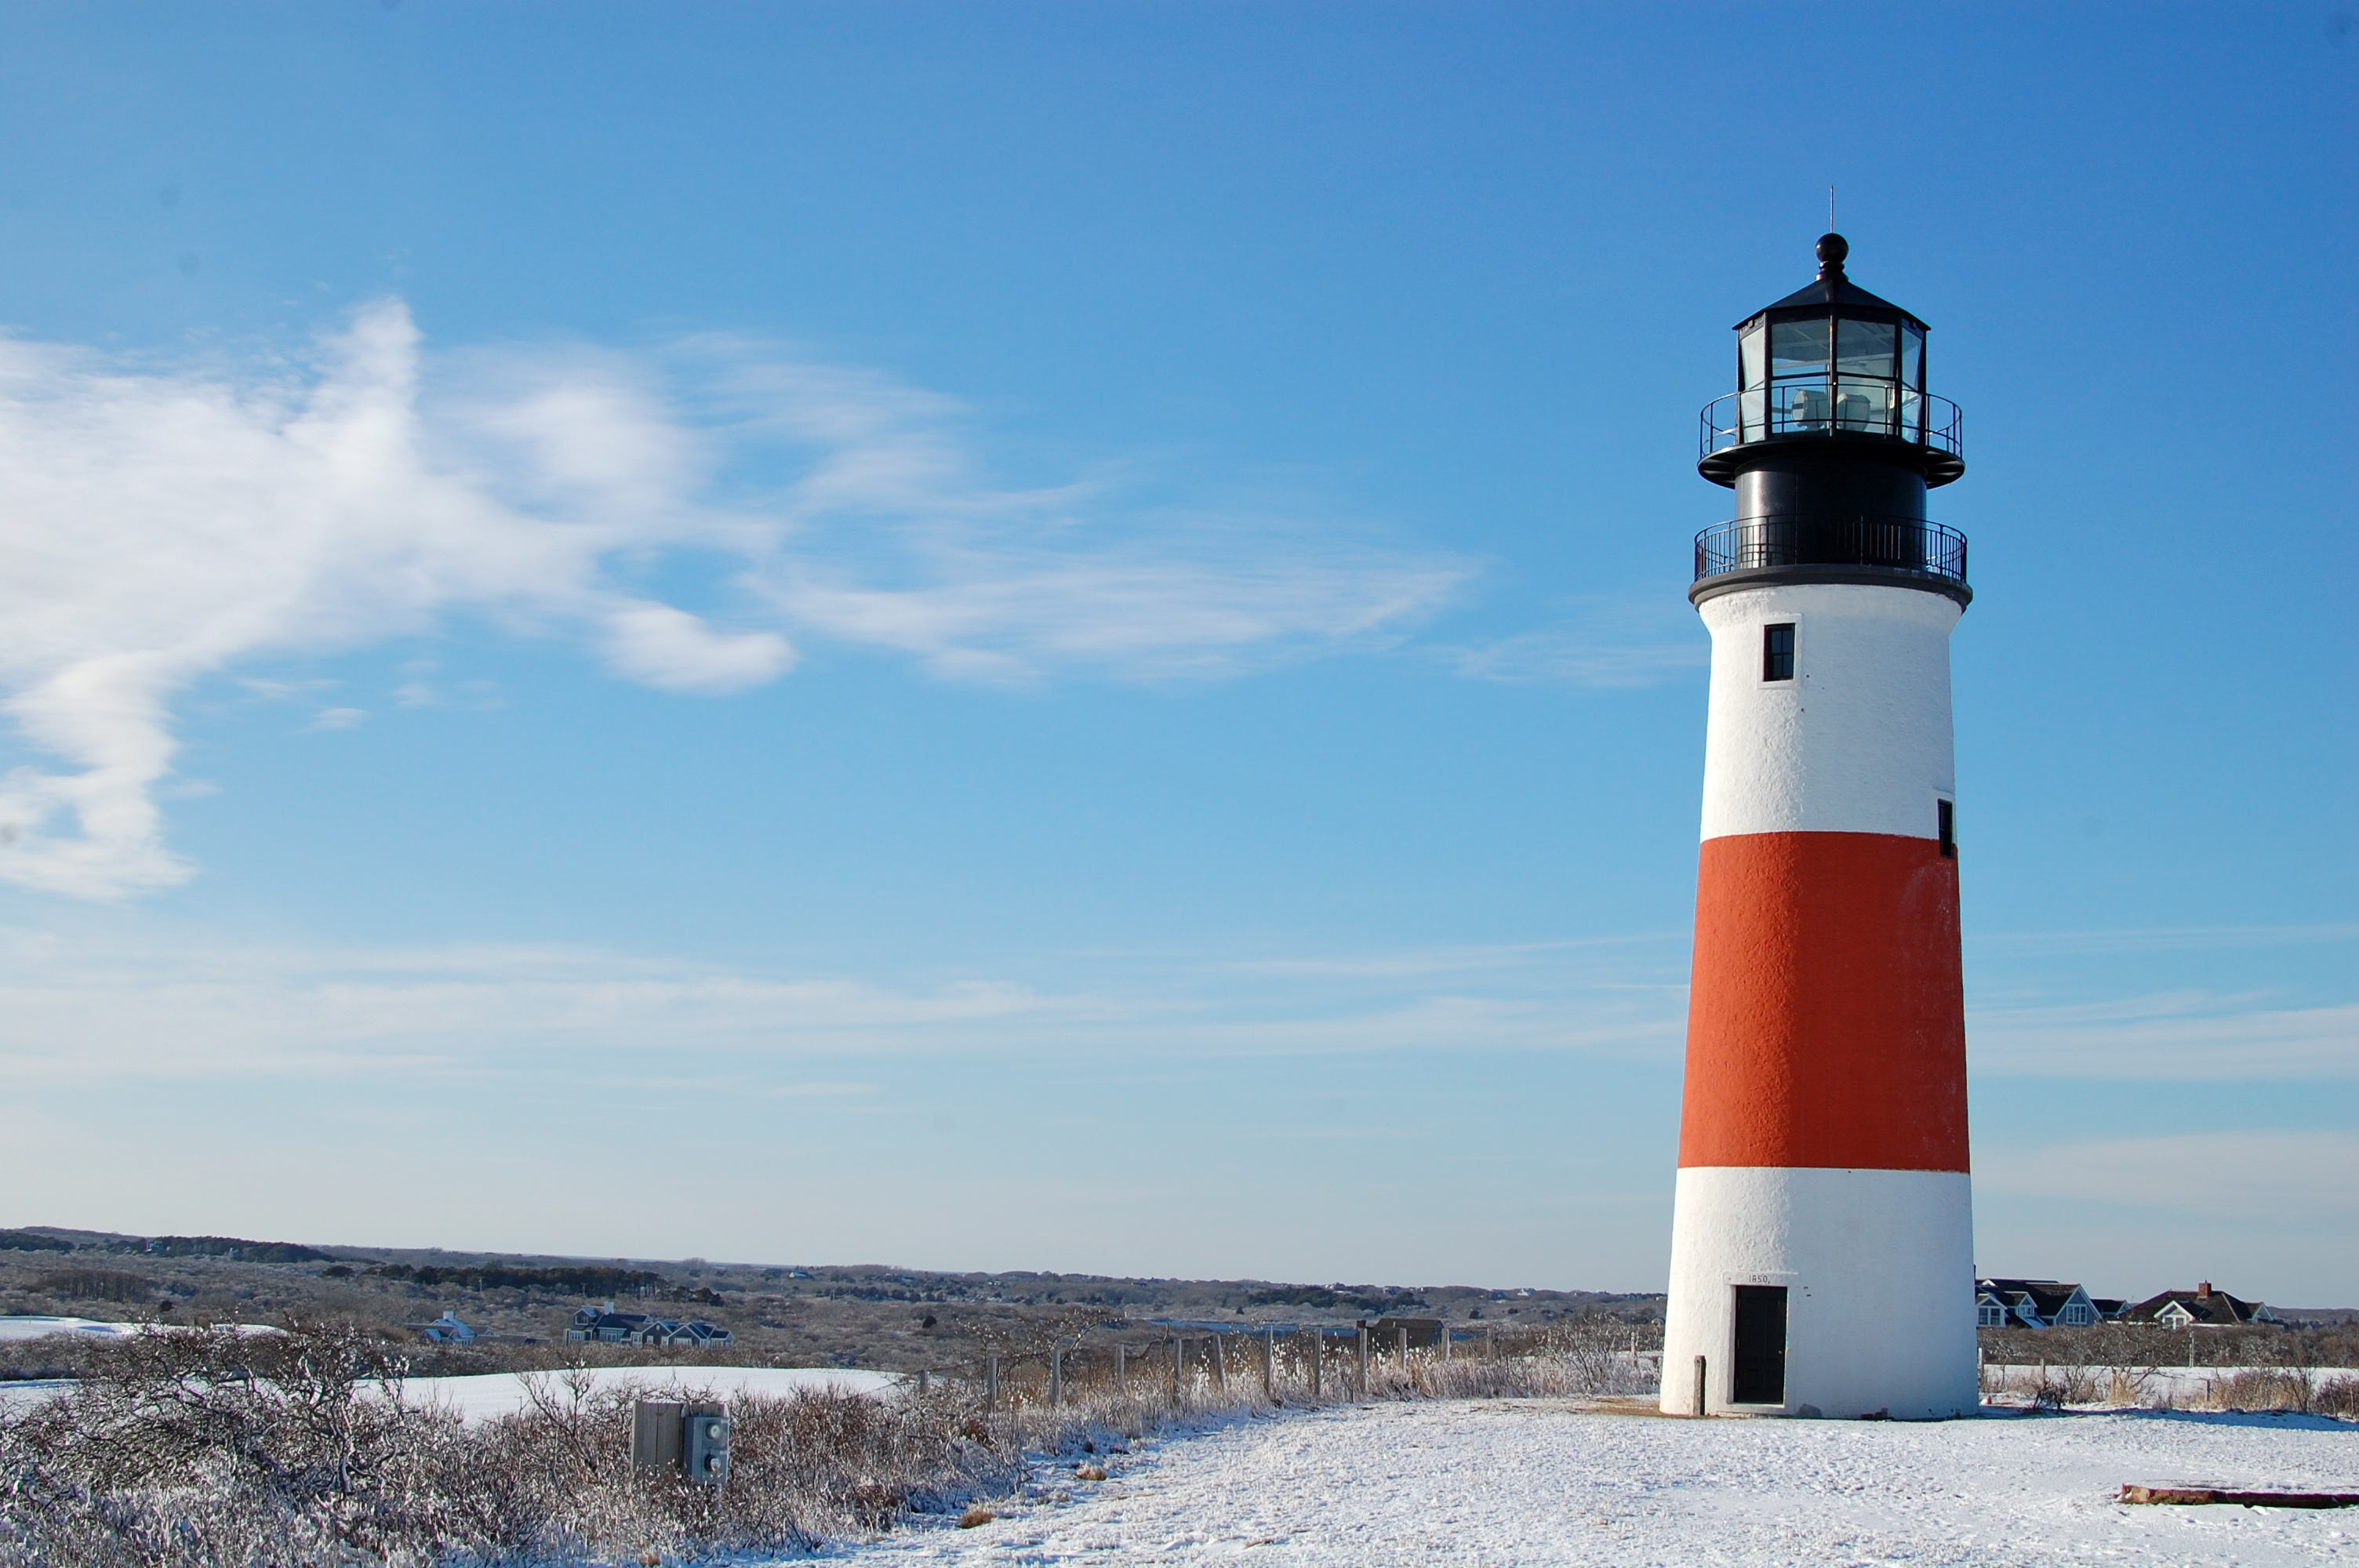 Think, Sankaty lighthouse nantucket have